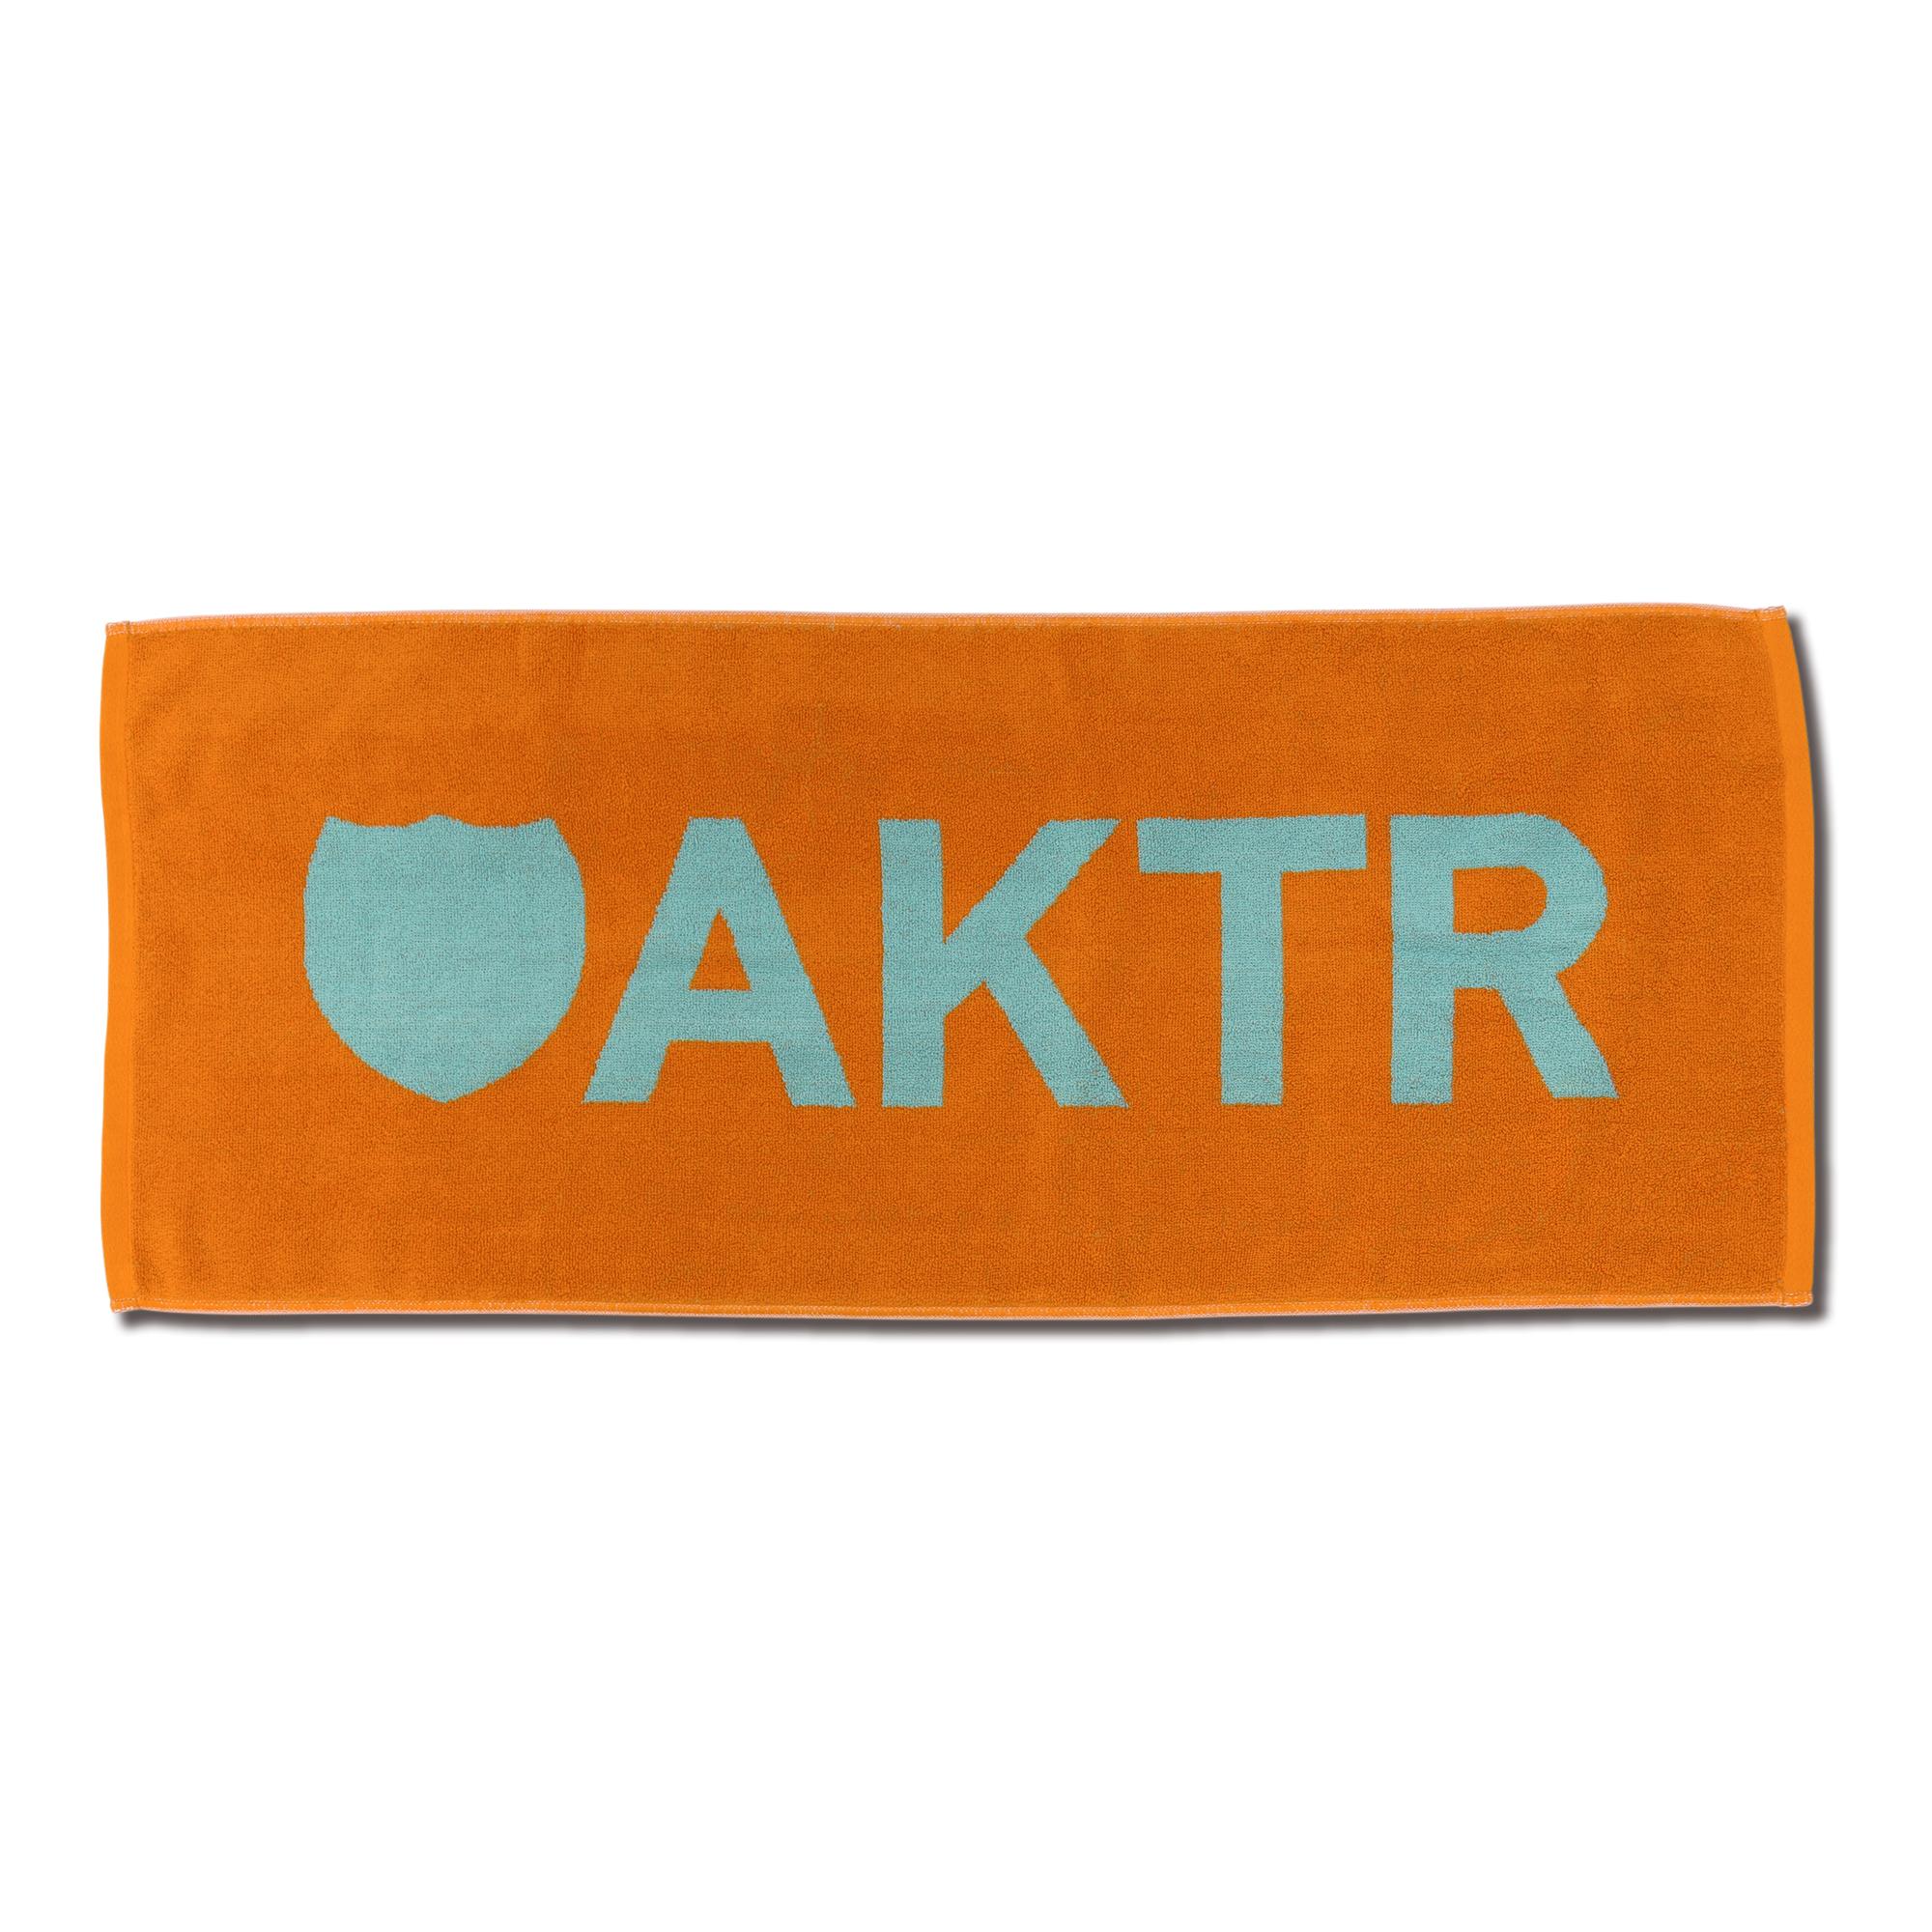 219-042021 / AKTR / SPORTS TOWEL LOGO / ORANGE / アクター / メンズ / バスケットボール / タオル